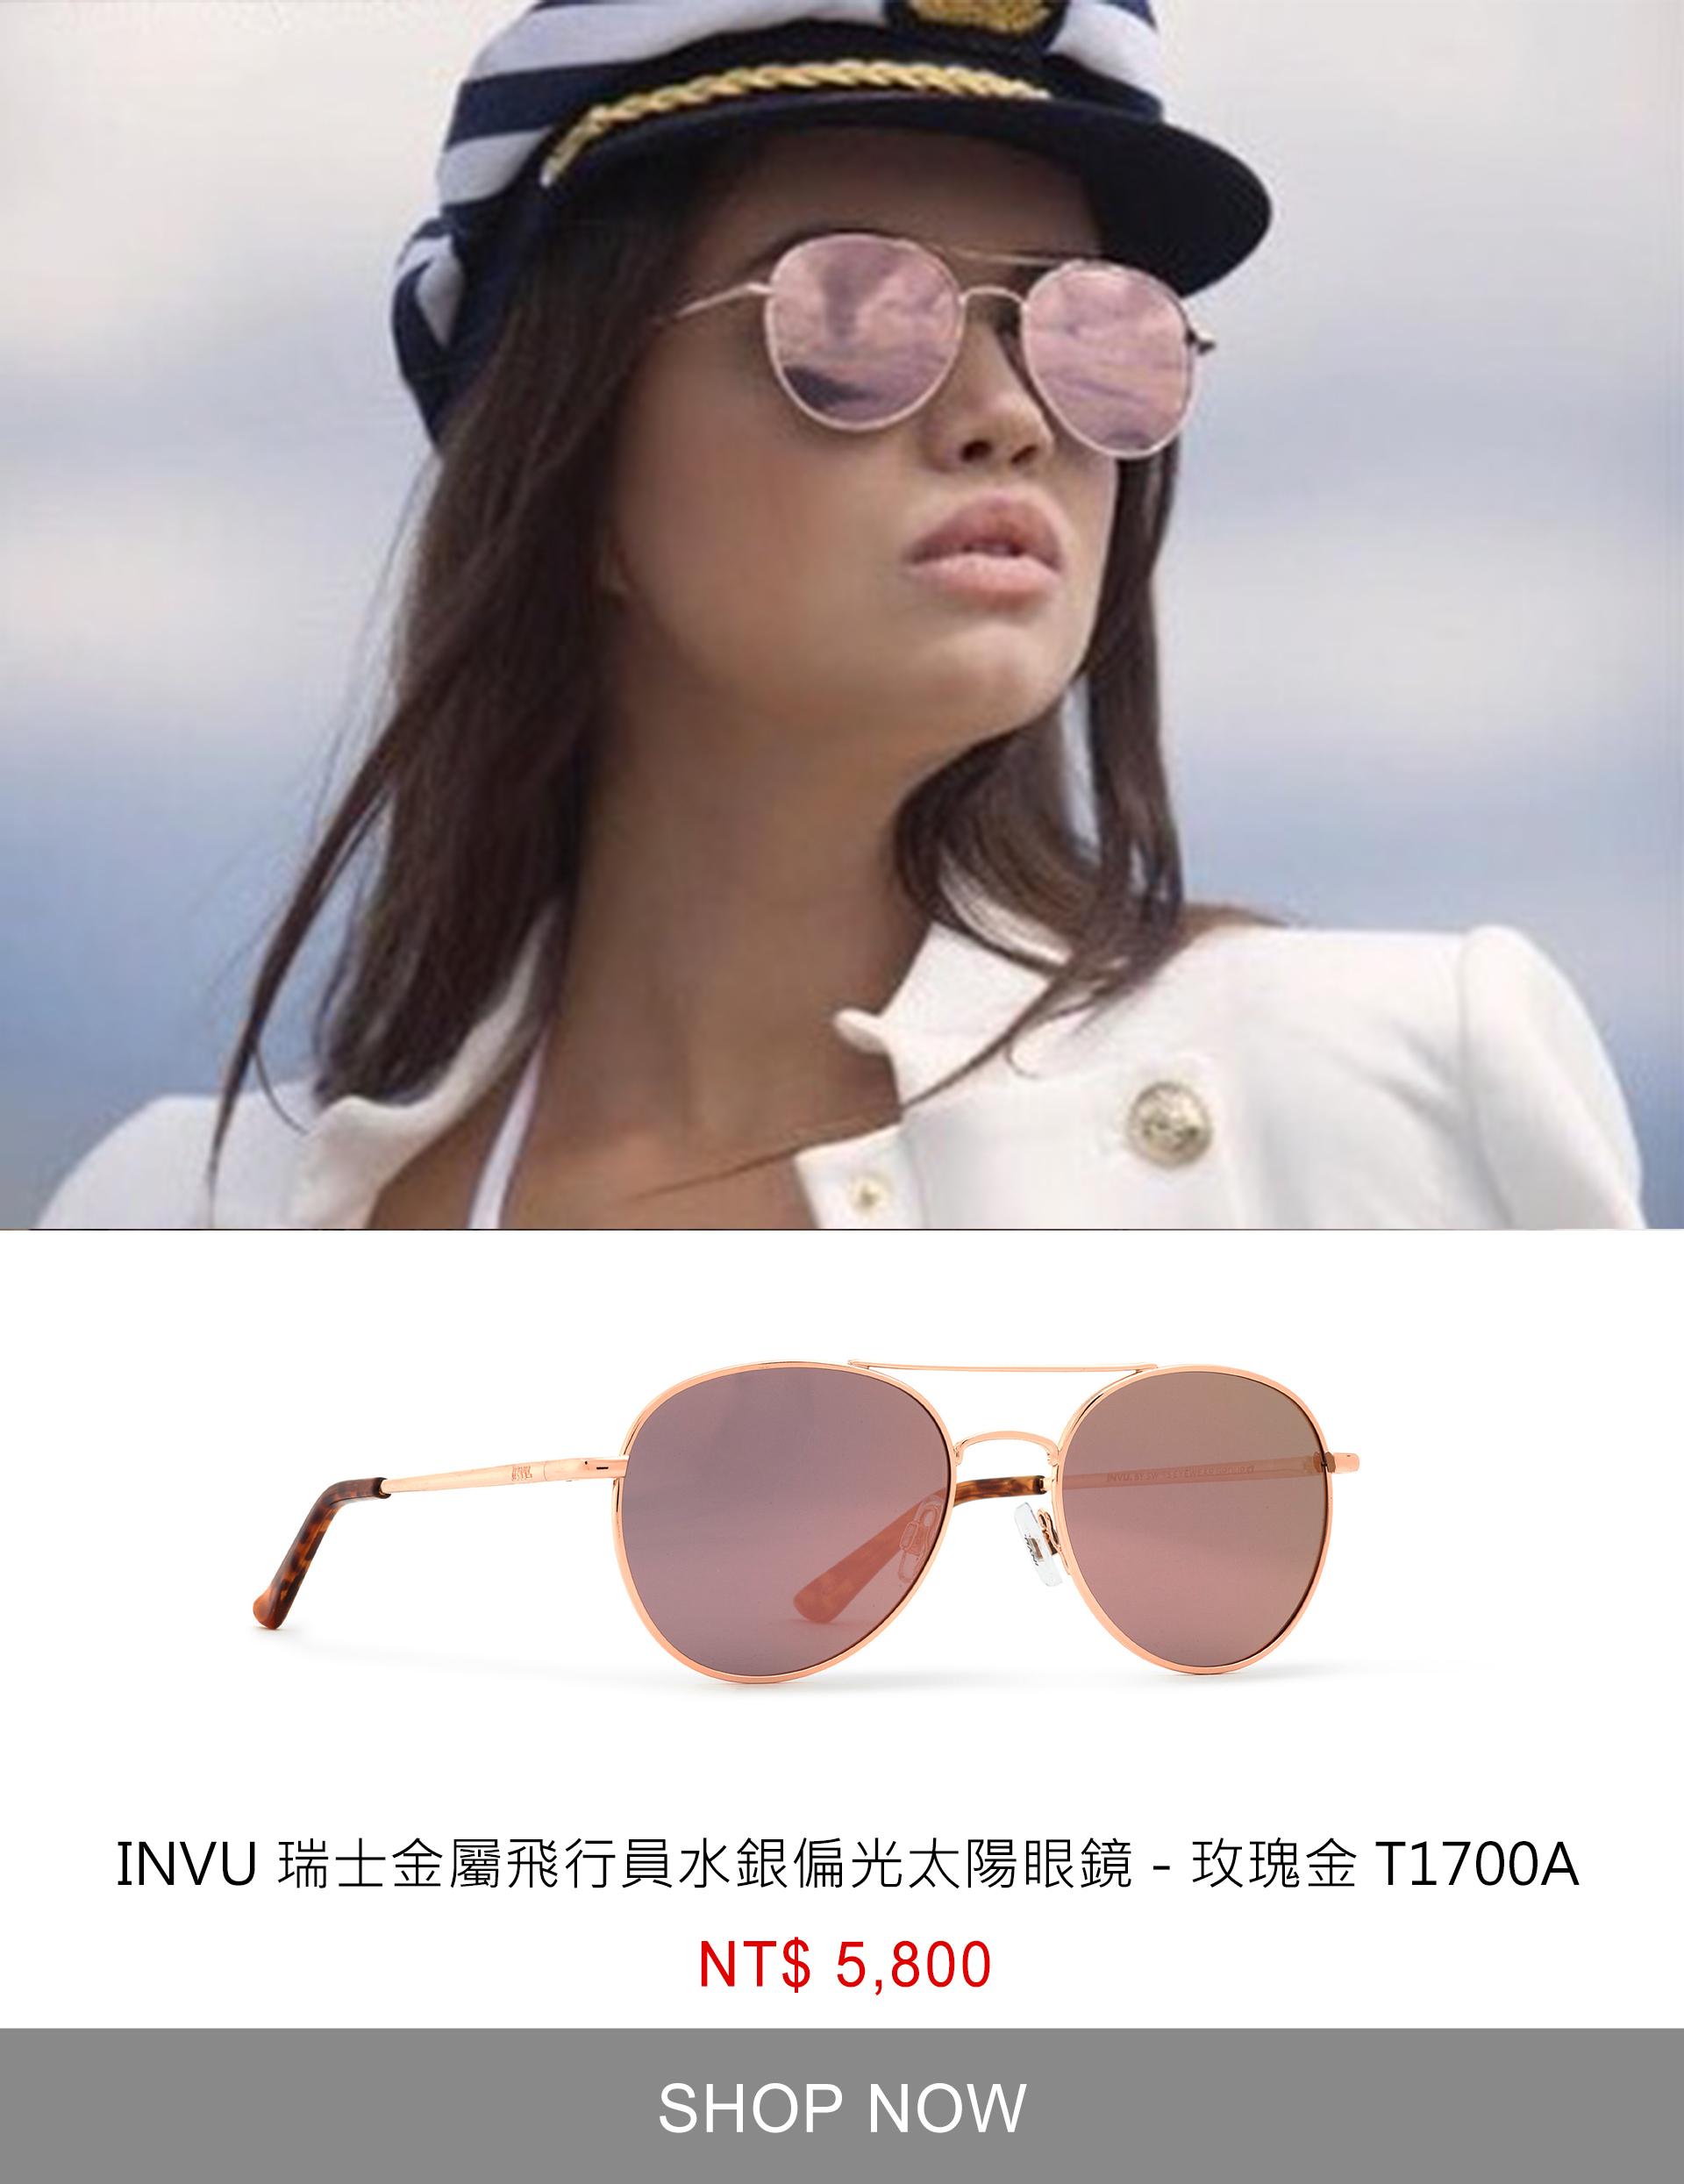 【INVU】瑞士金屬飛行員水銀平面偏光太陽眼鏡(玫瑰金)▶ 雜誌款 T1700A